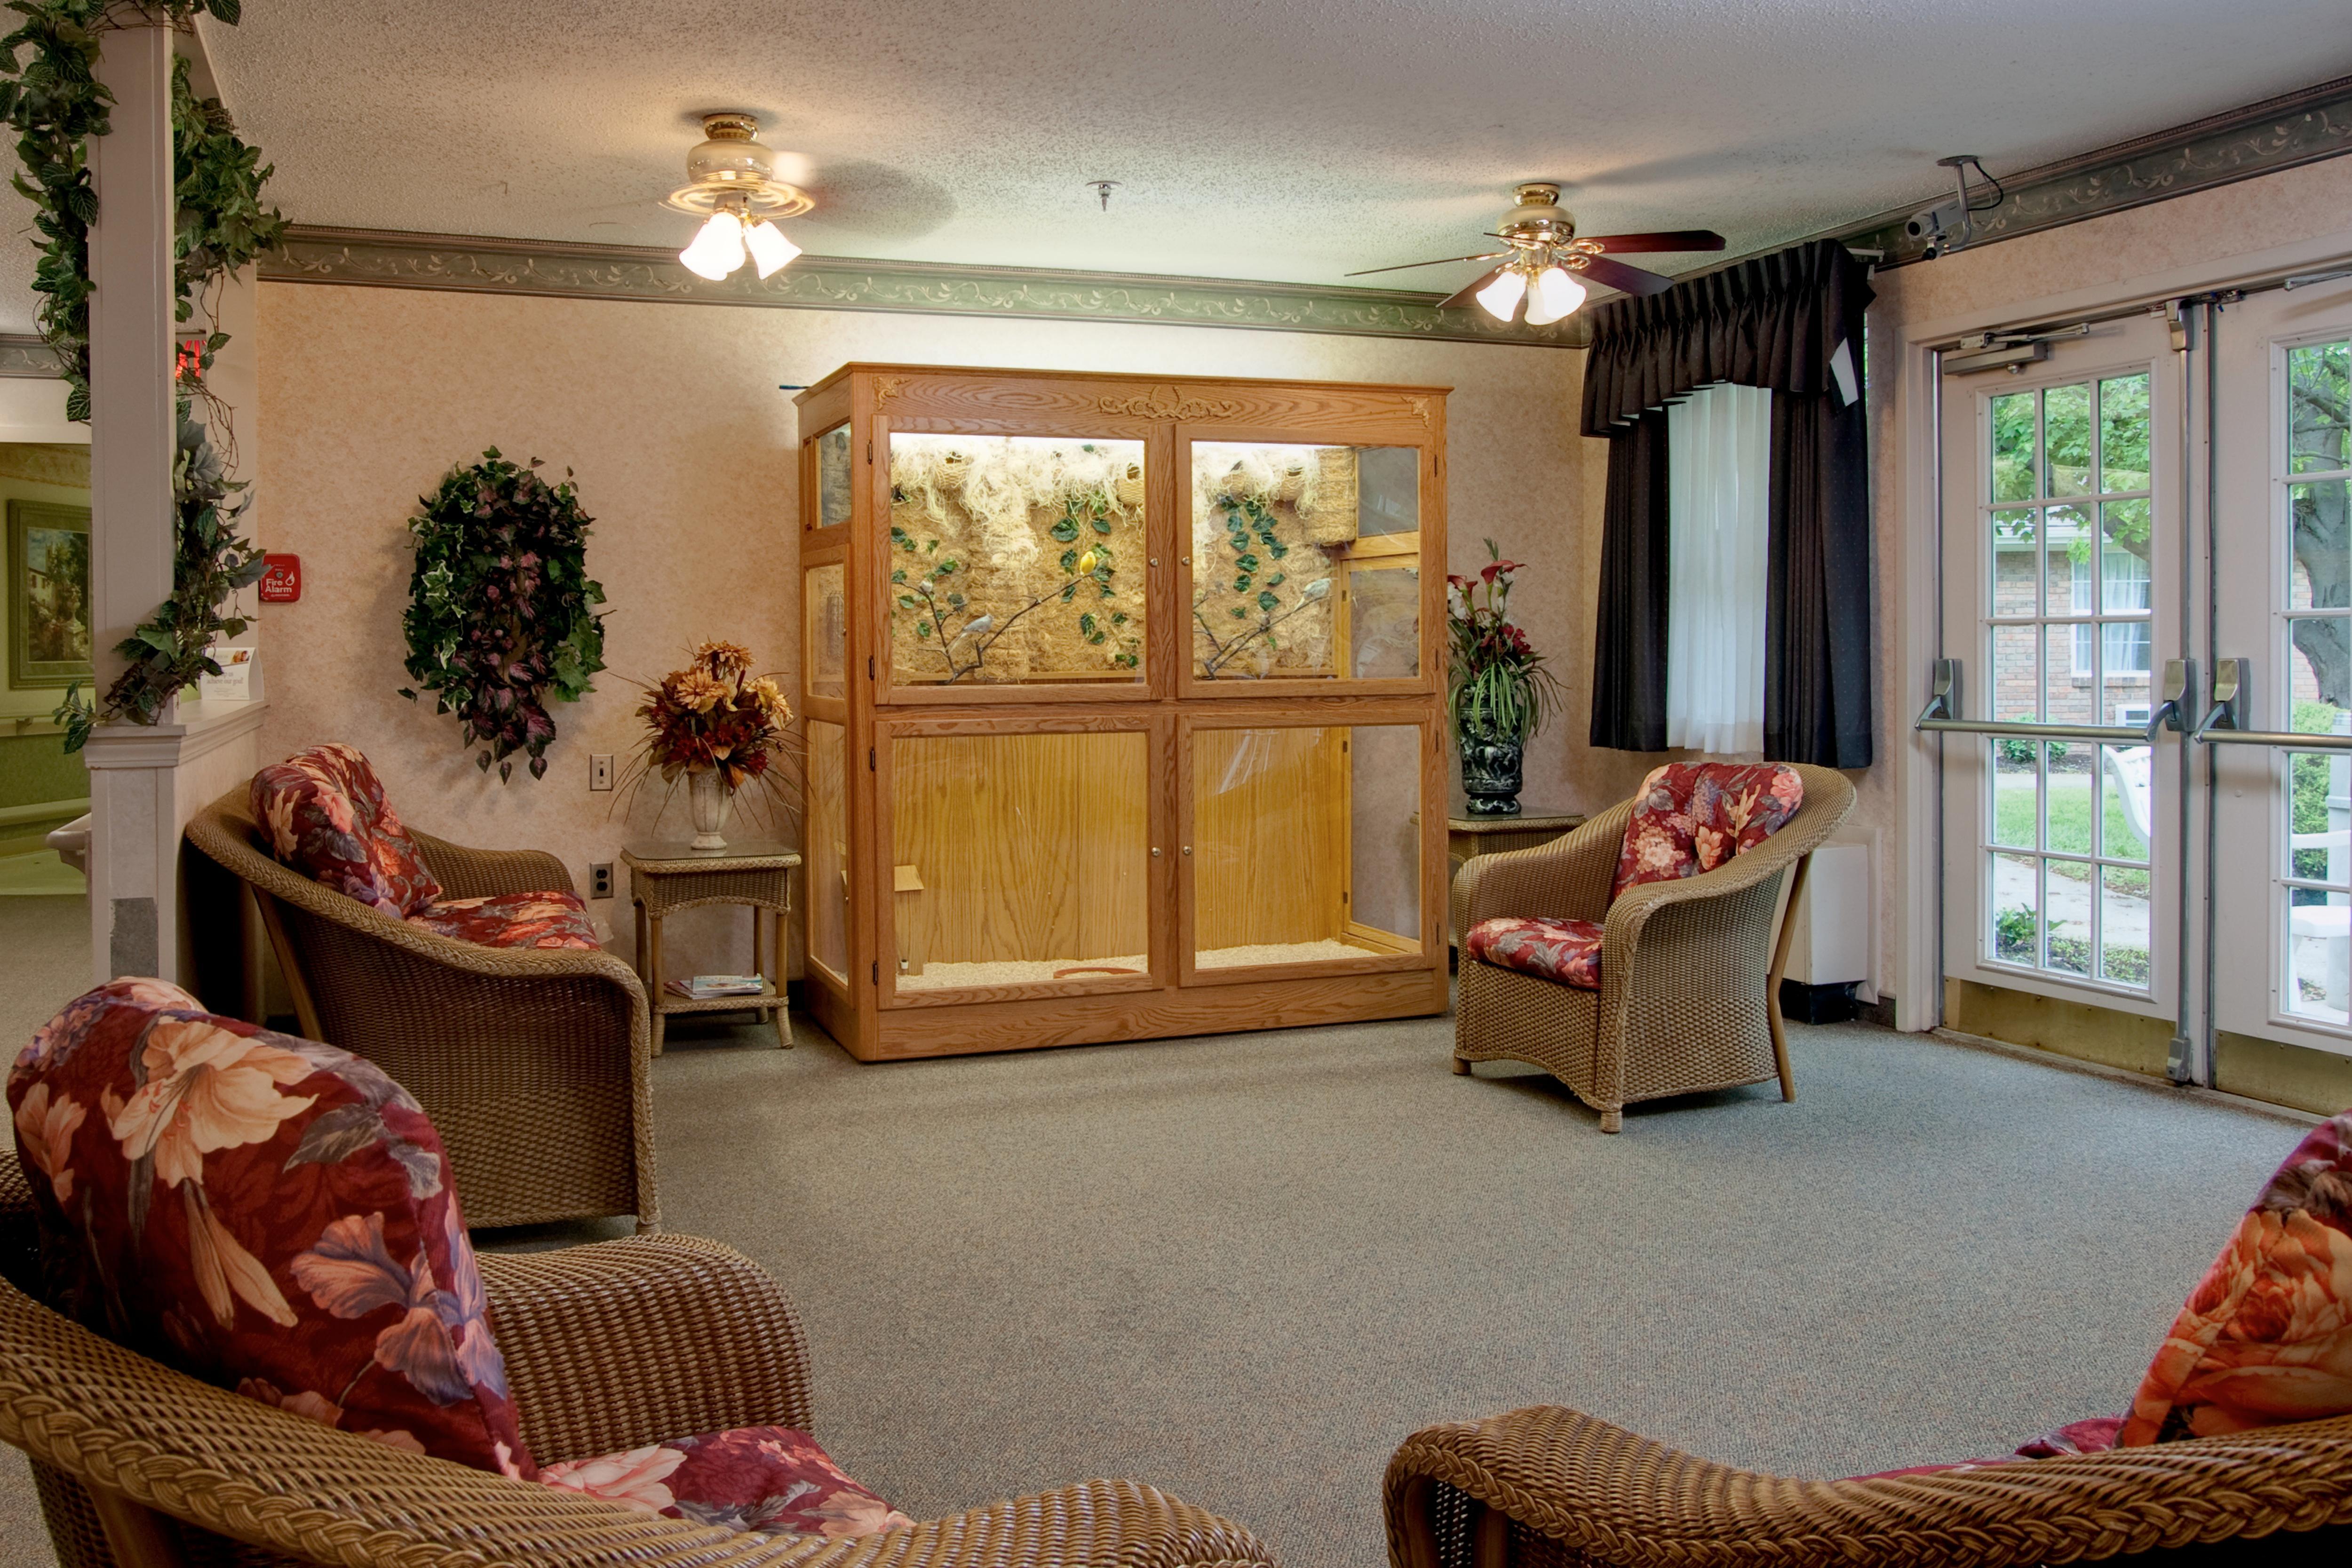 Cypress Grove Rehabilitation Center image 2